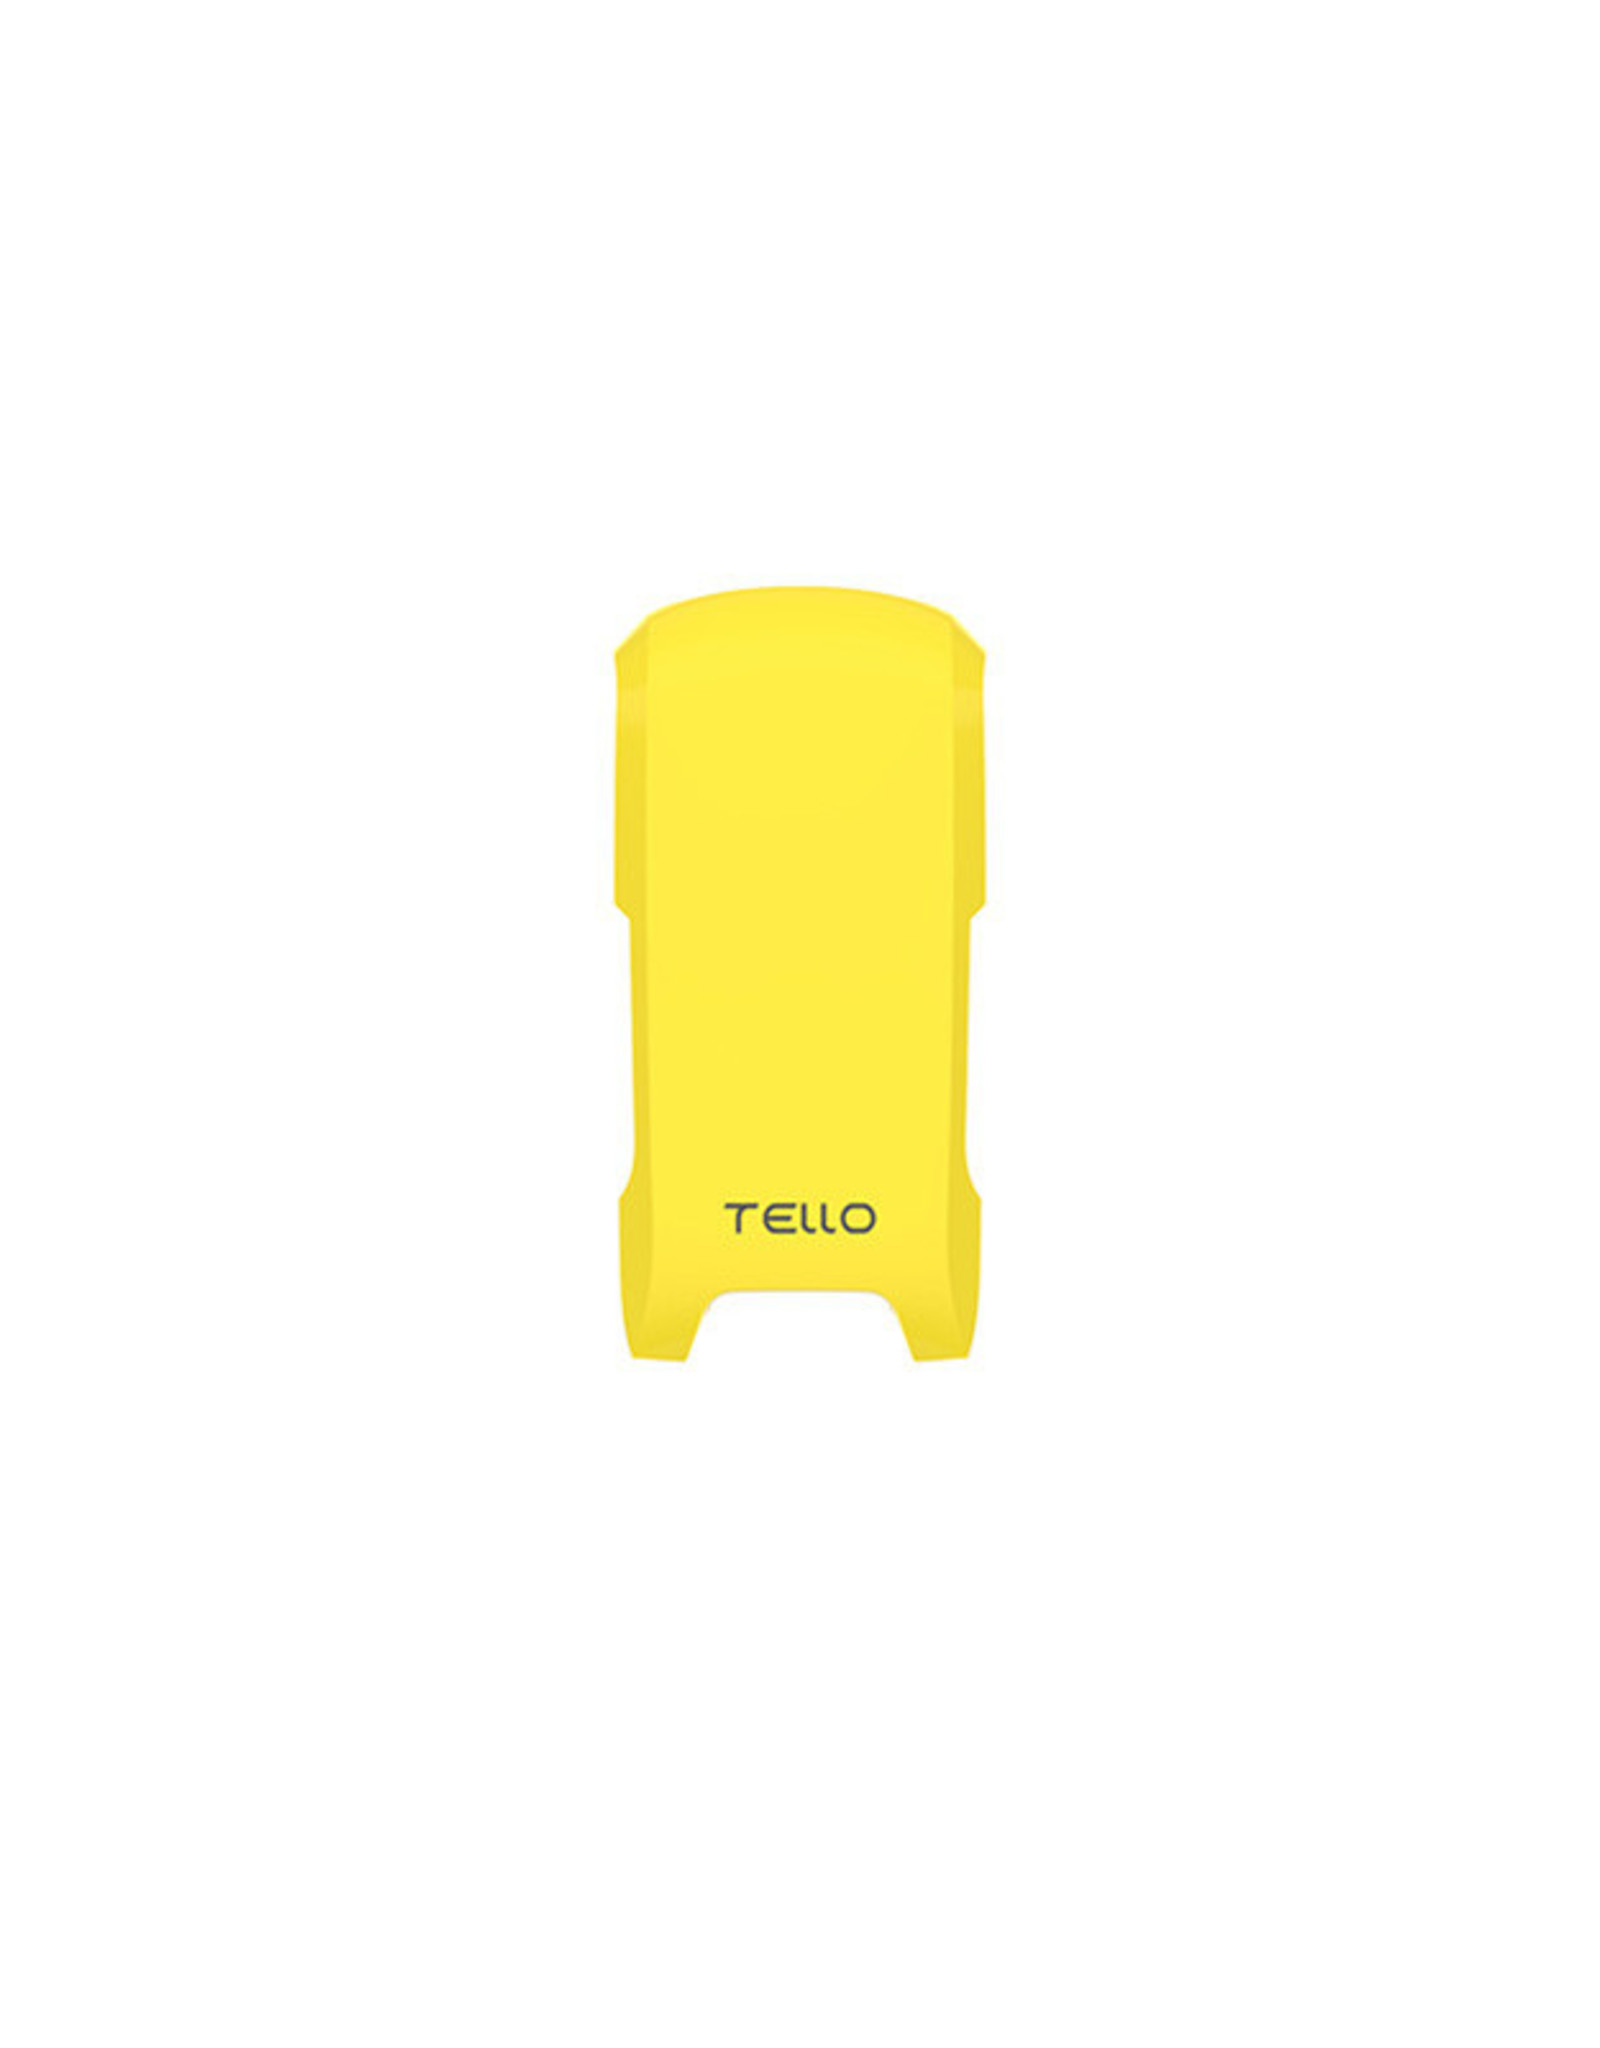 DJI Tello Snap On Top Cover (Yellow)